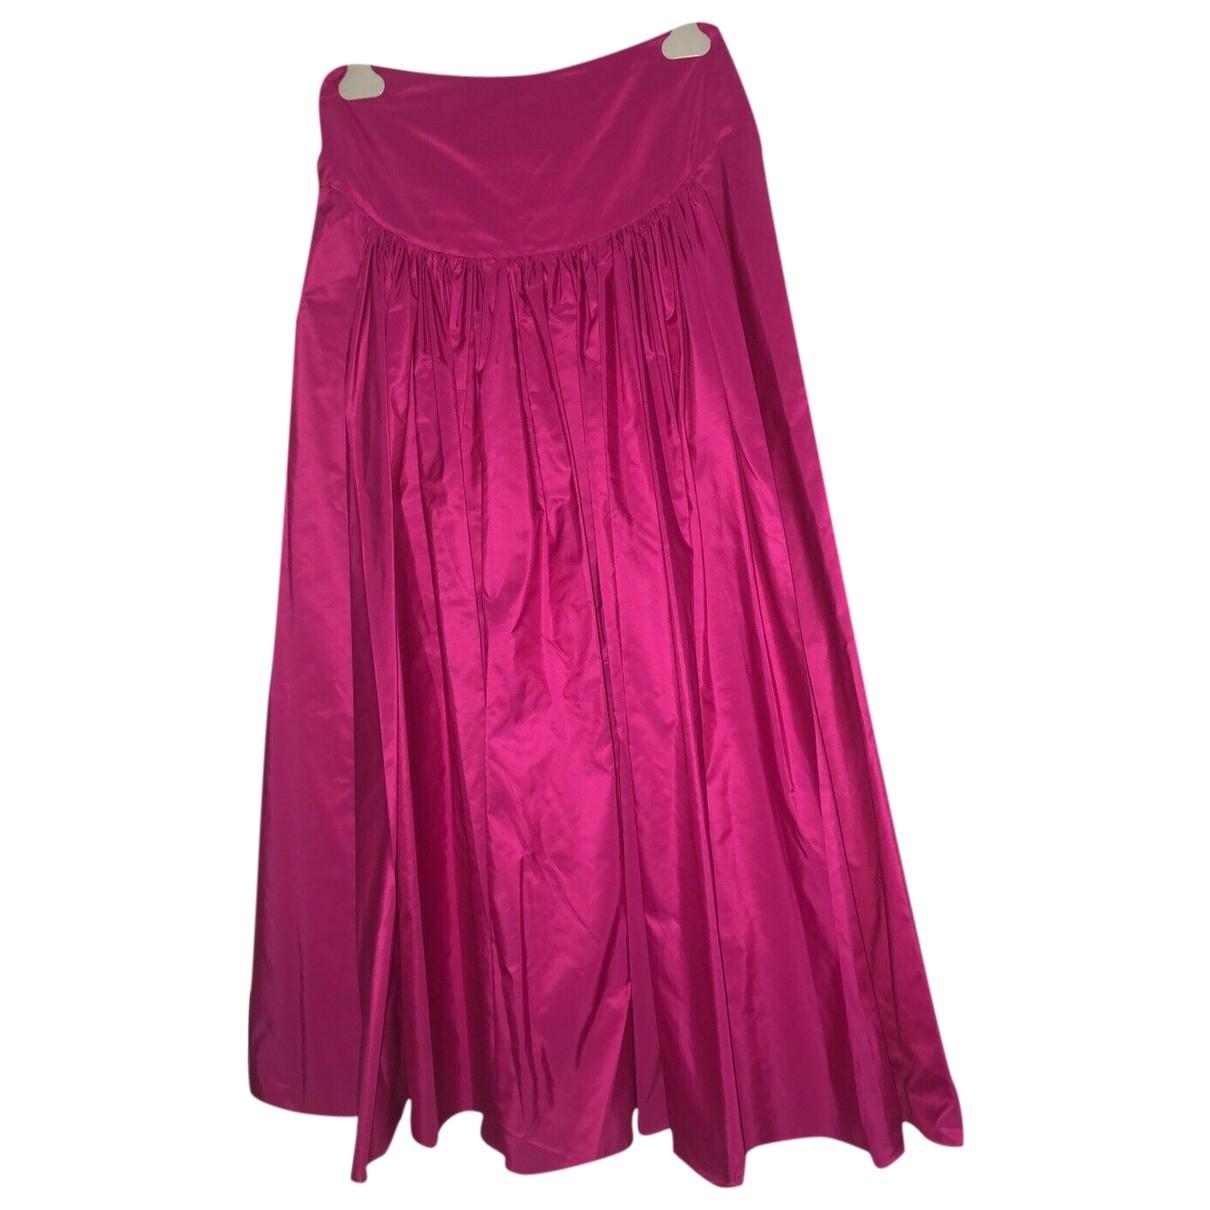 Stella Mccartney \N Pink skirt for Women 40 IT